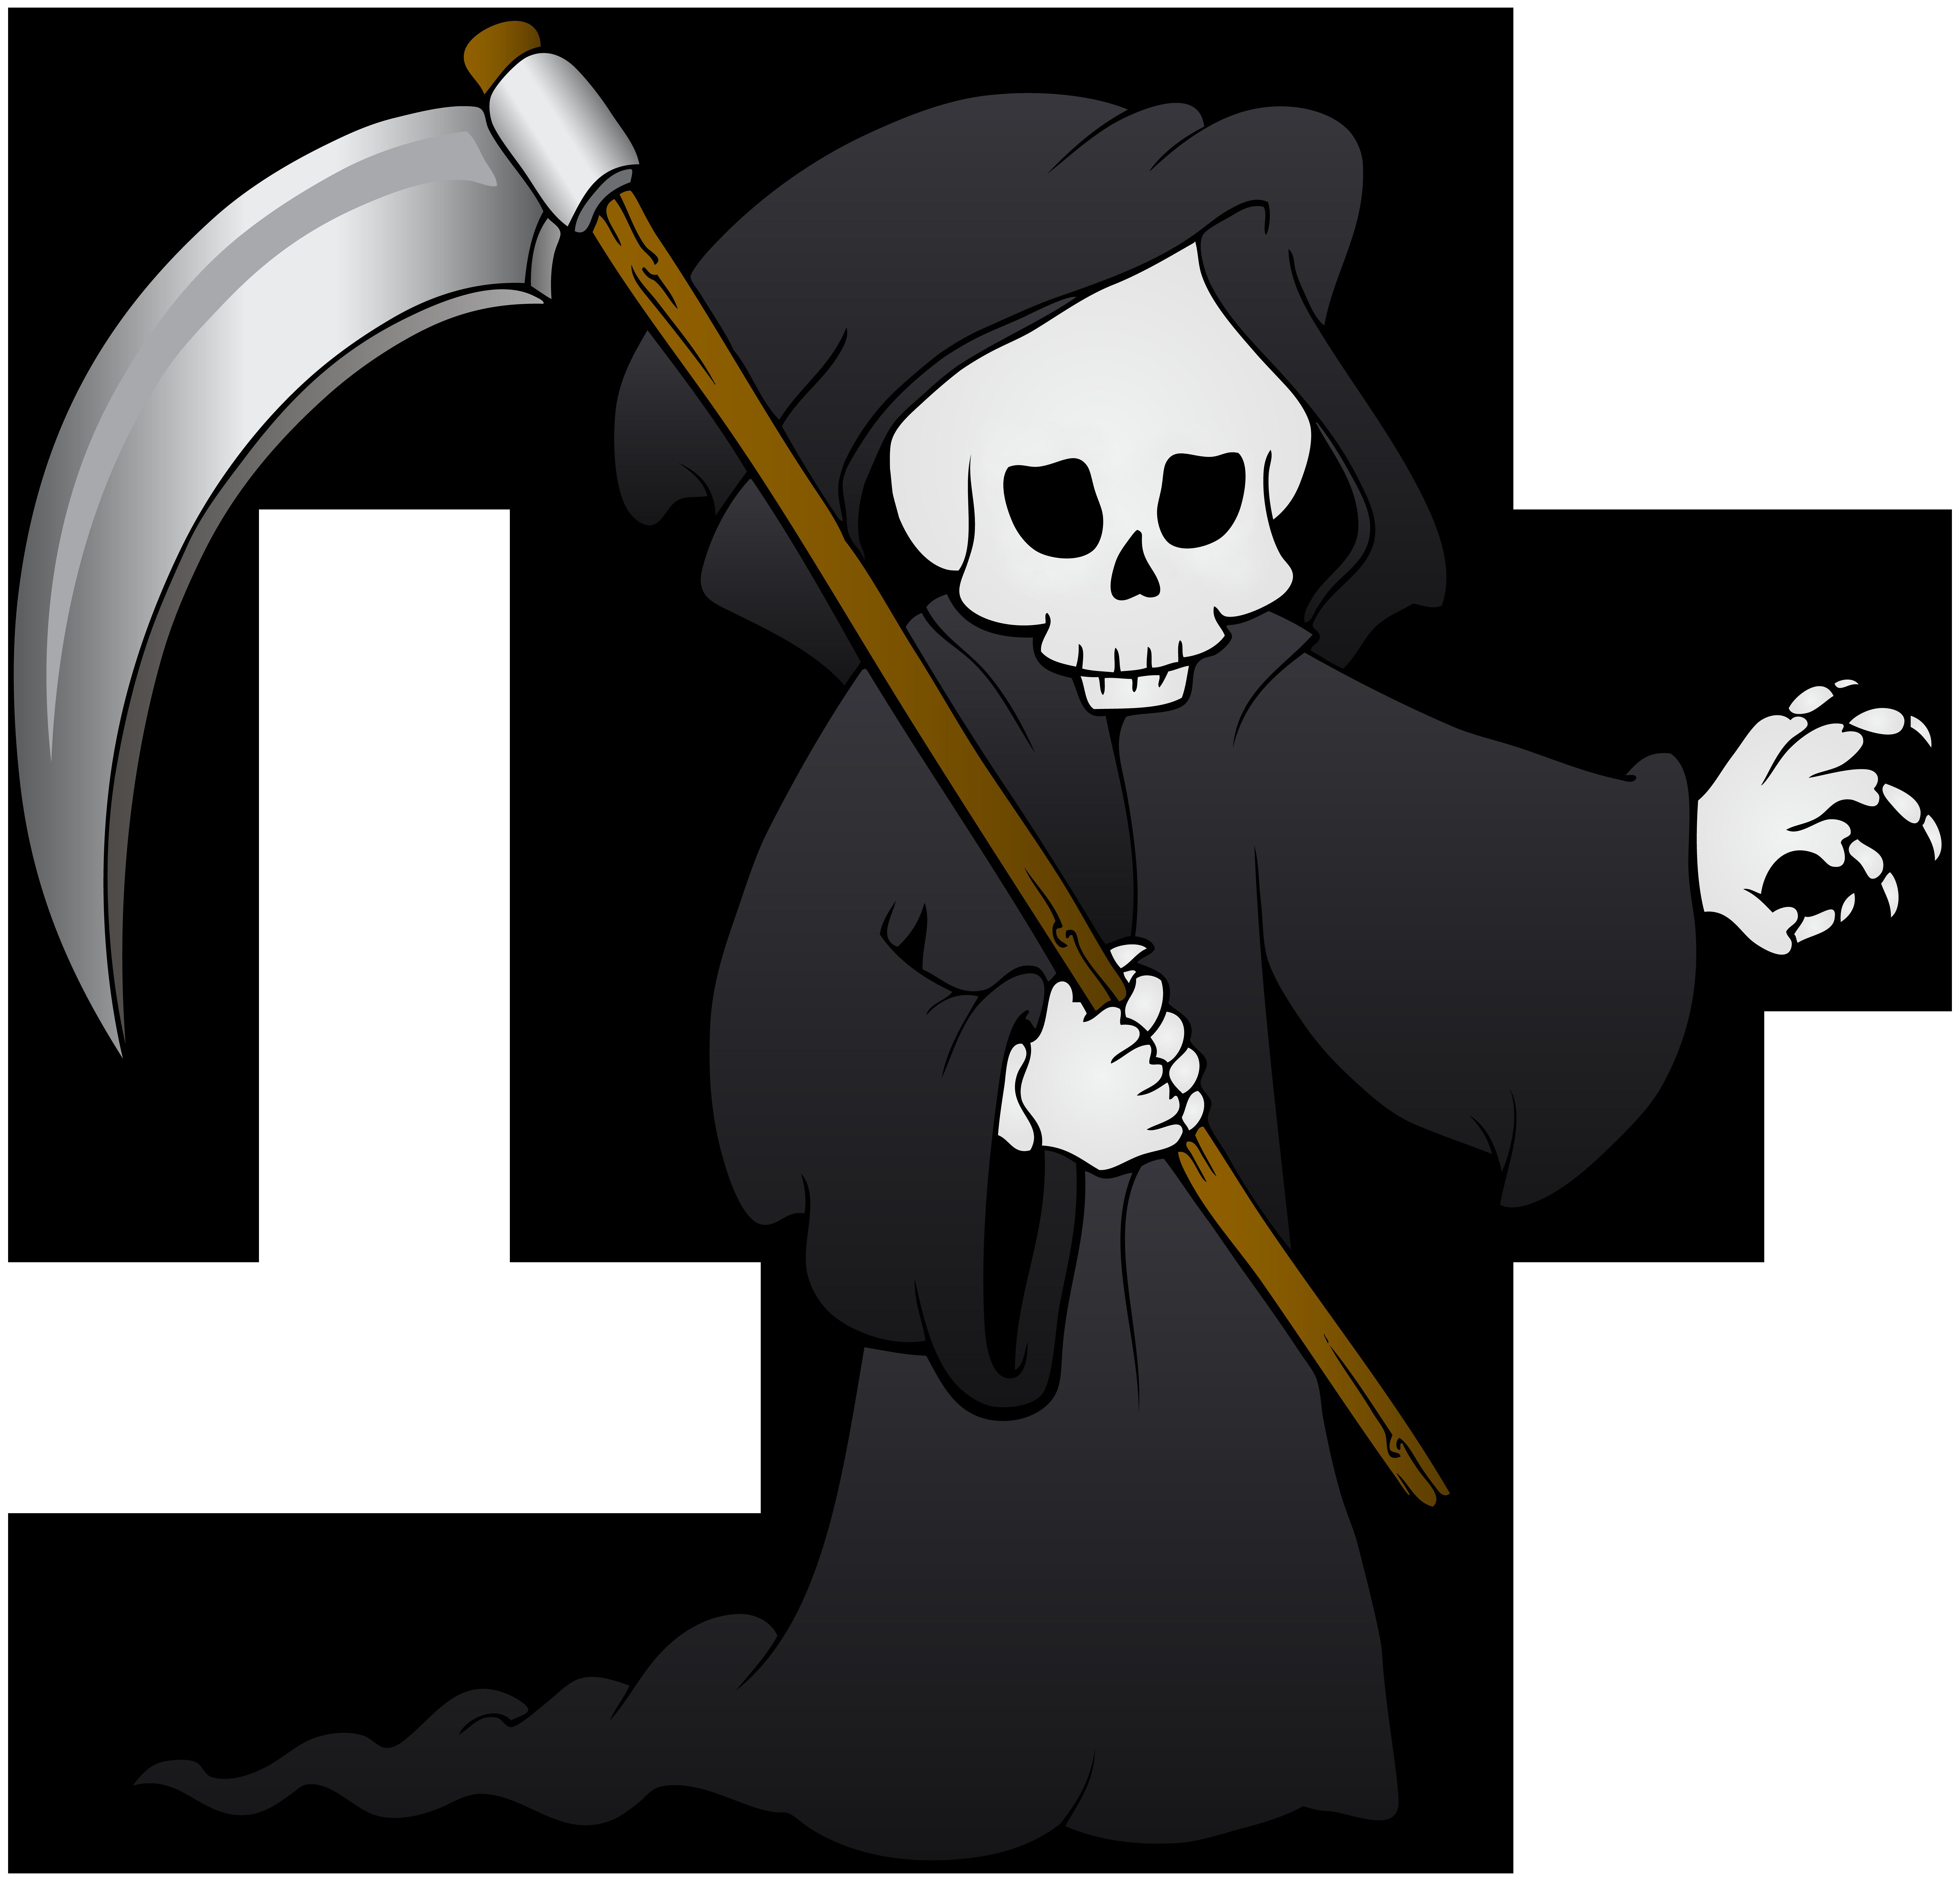 Grim reaper clipart, Grim reaper Transparent FREE for ...